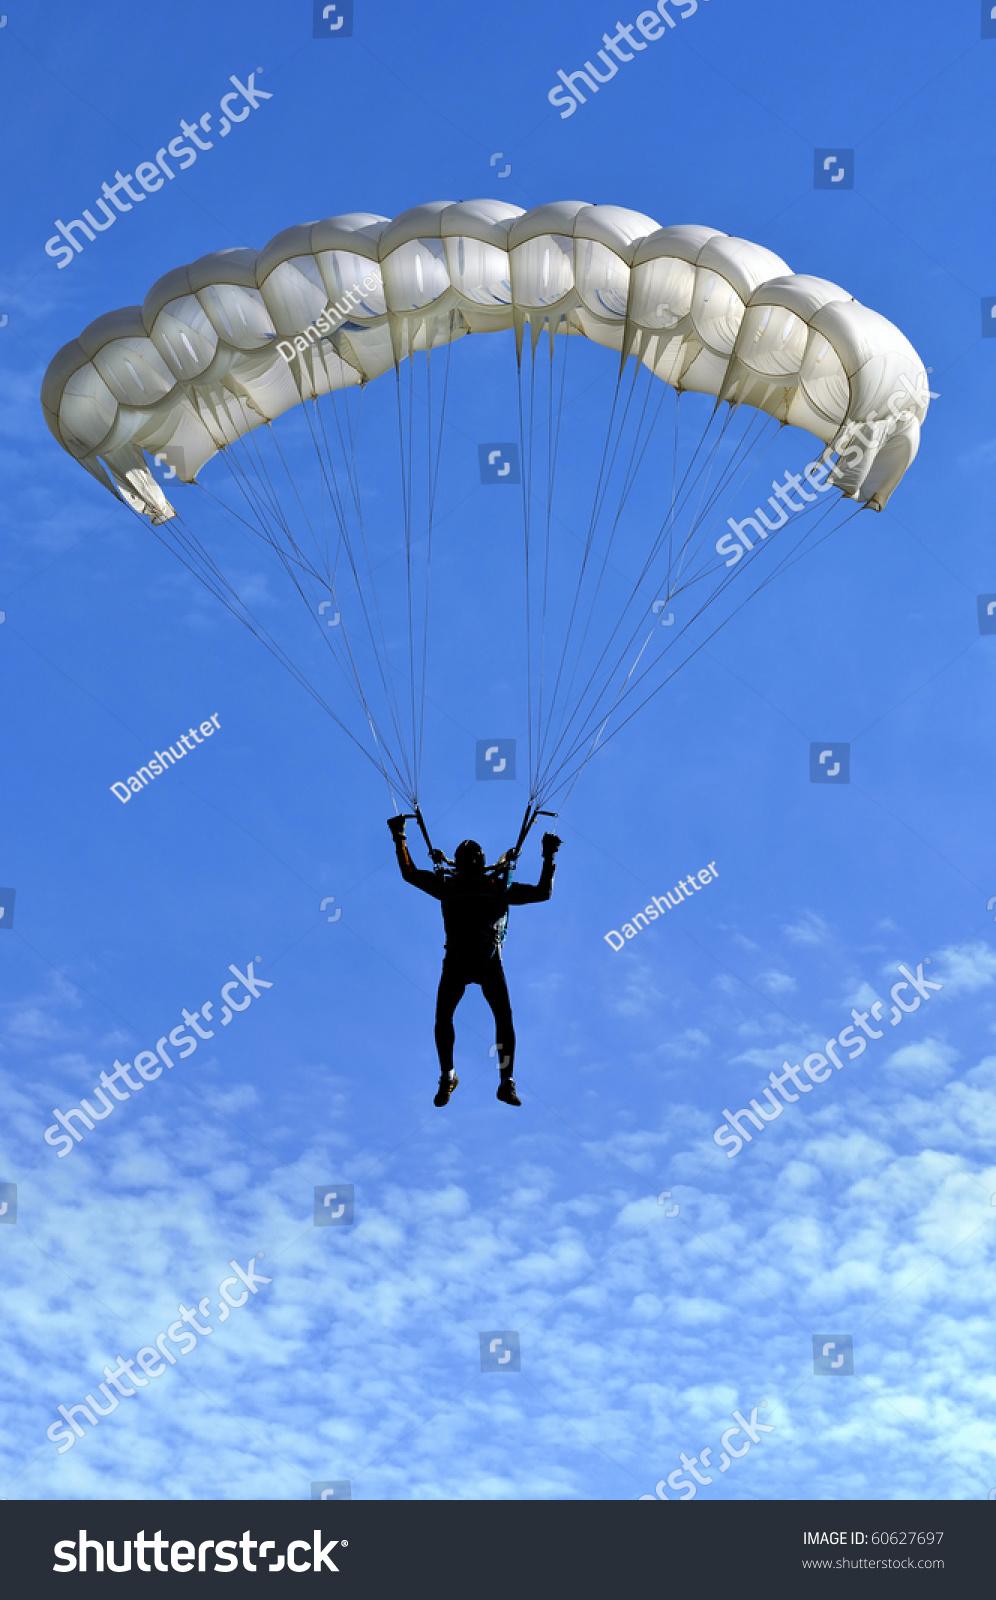 White Parachute On Blue Sky Stock Photo 60627697 ...